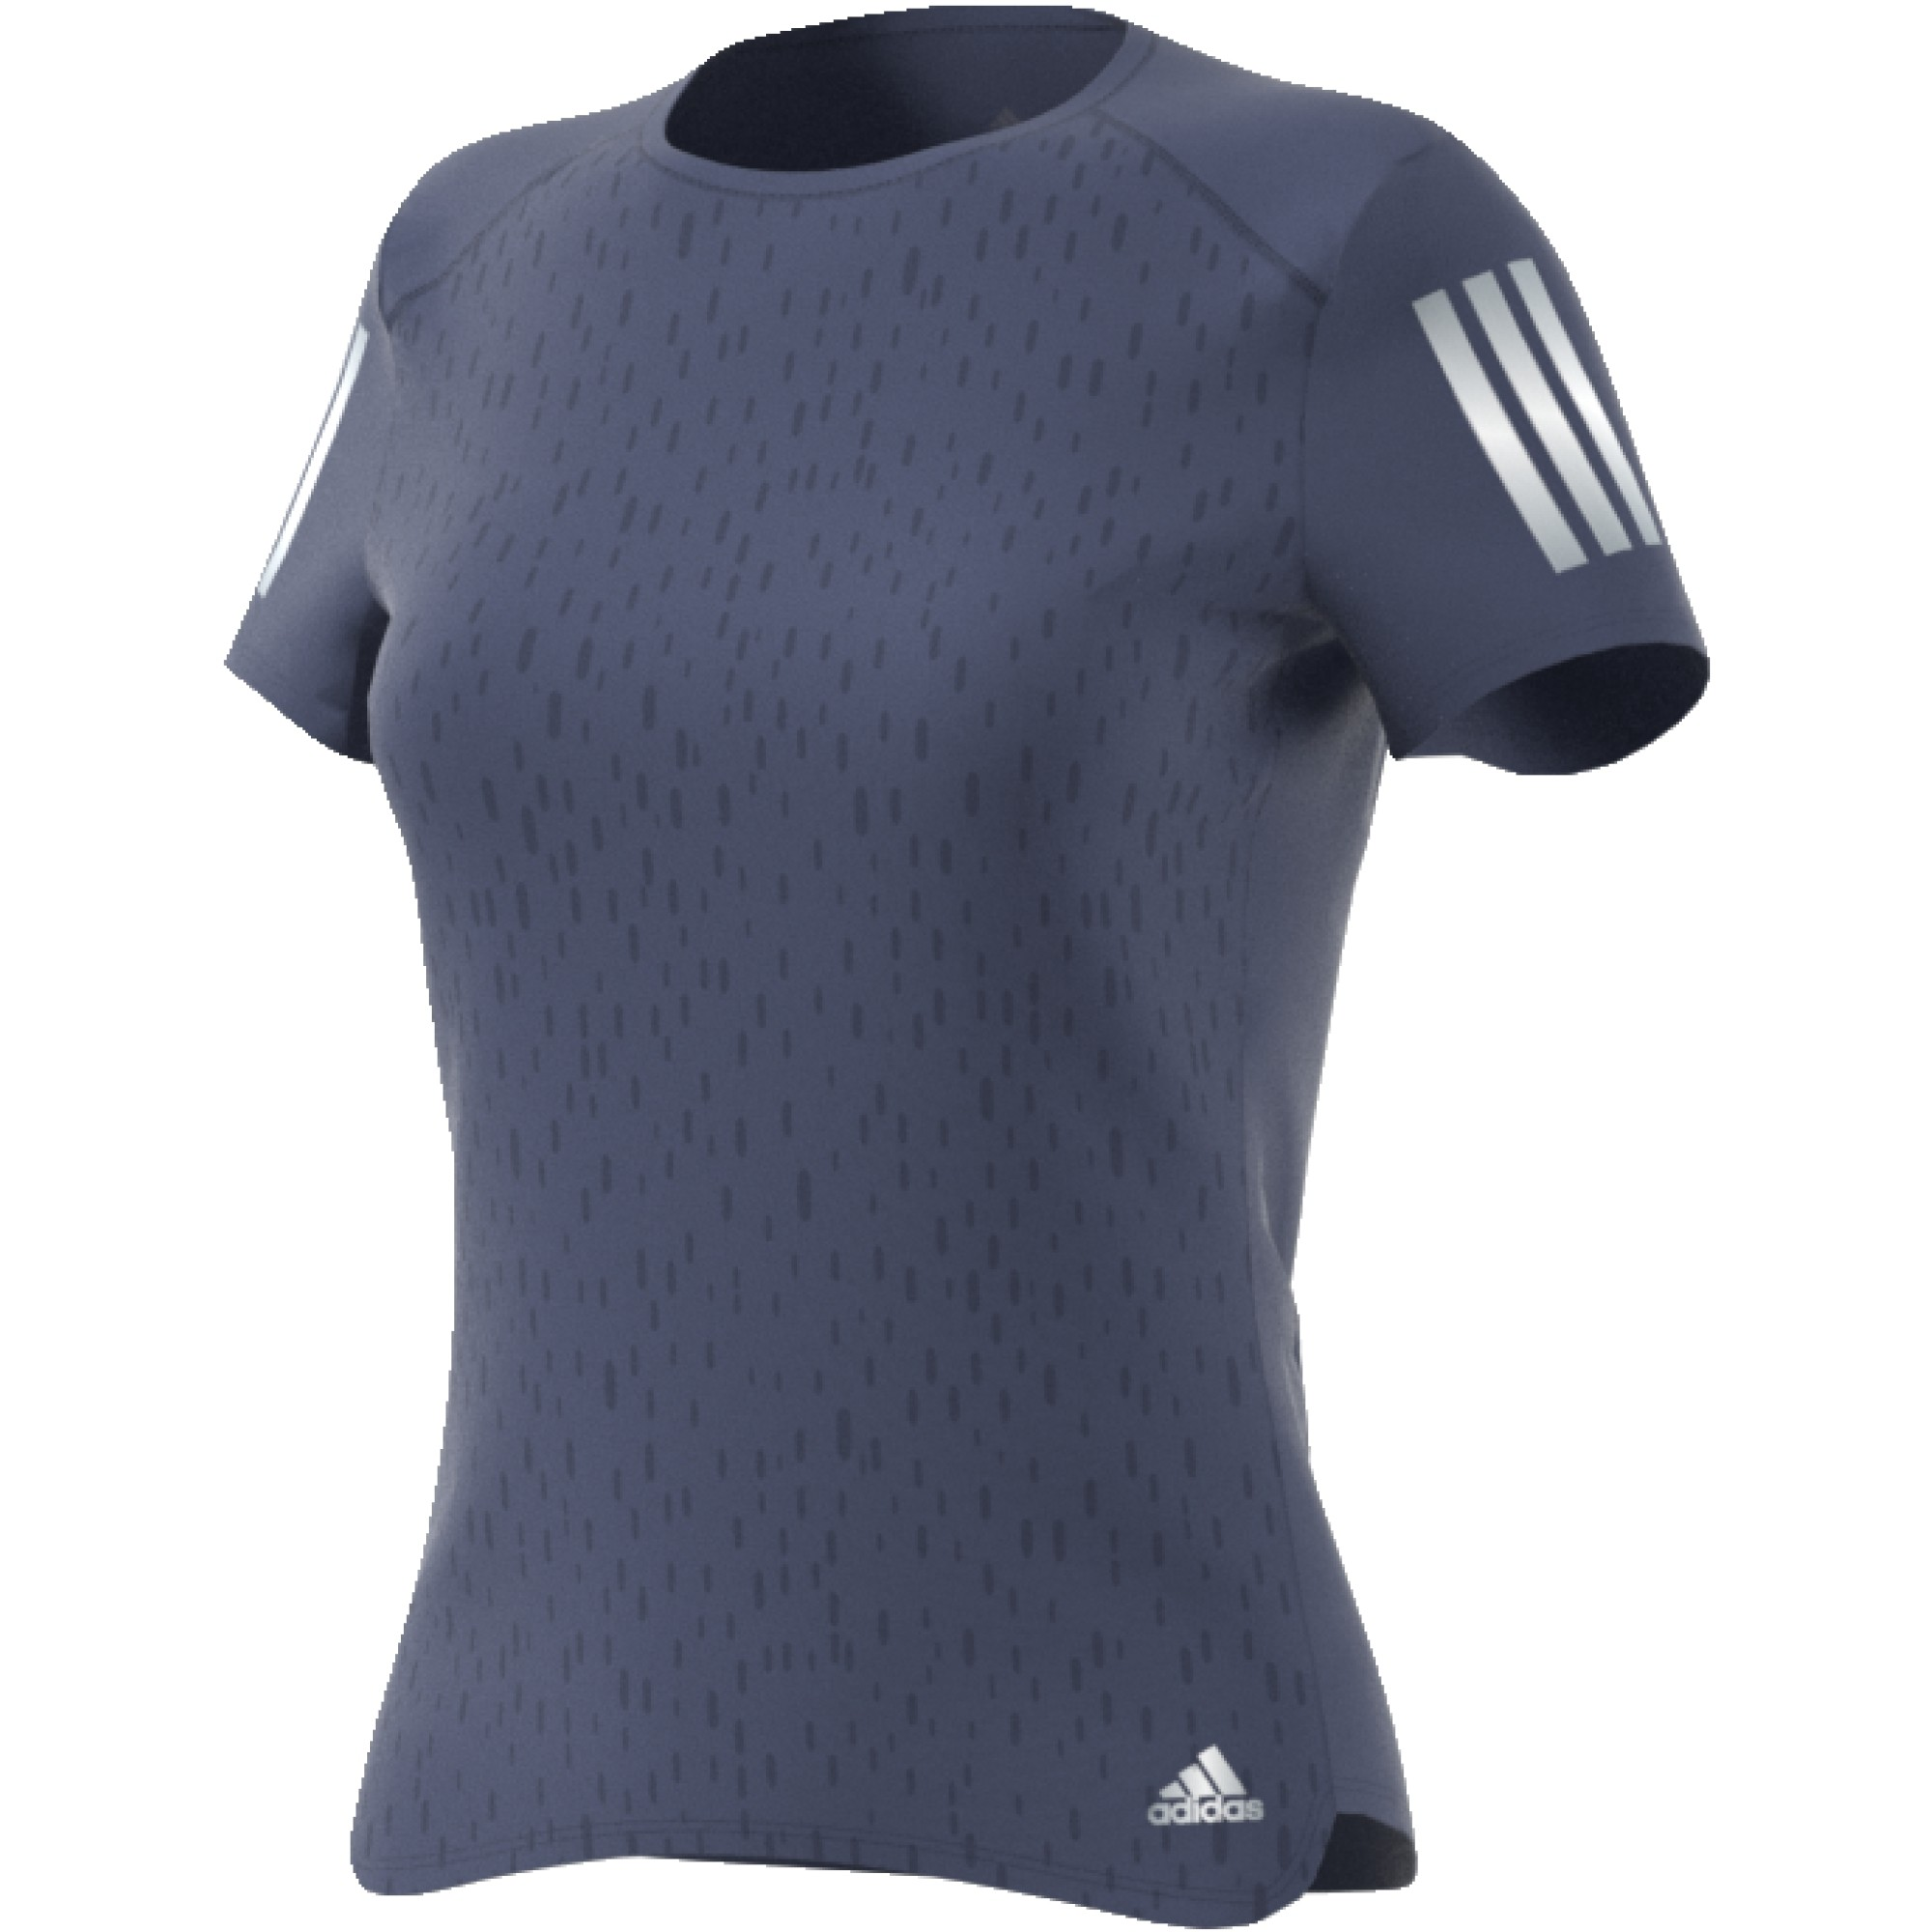 d7512c837b2c9 adidas-response-short -sleeve-tee-laufshirts-damen-blau-pid-000000000010137771.jpg